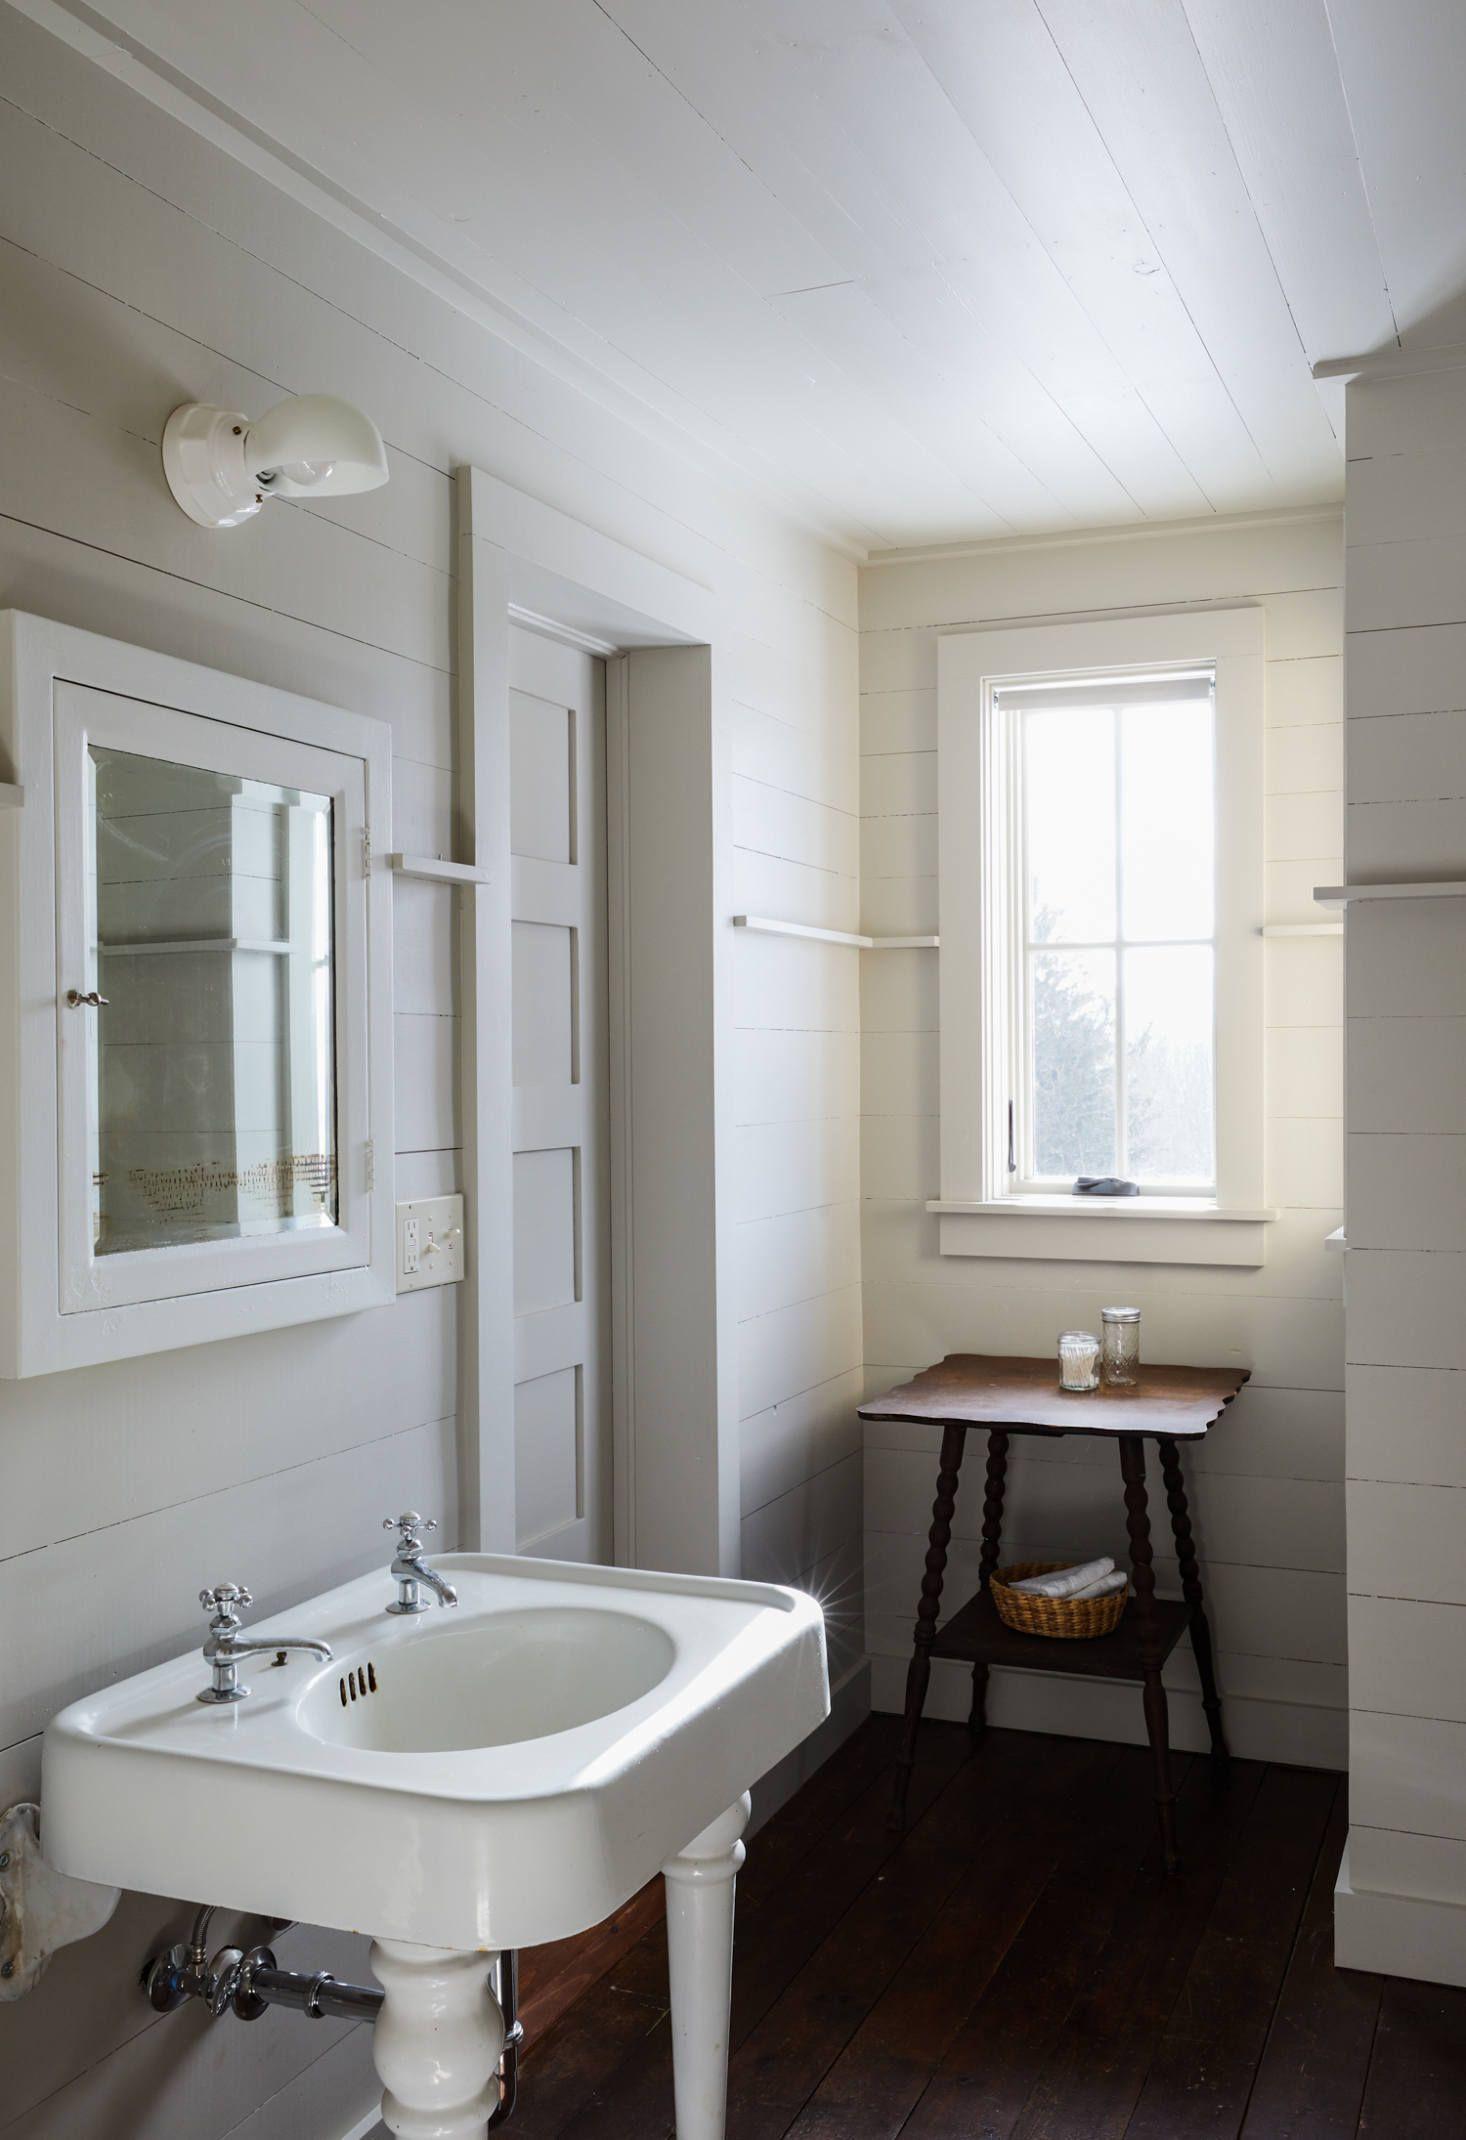 12 Budget Bathroom ideas   bathroom inspiration, bathroom design ...